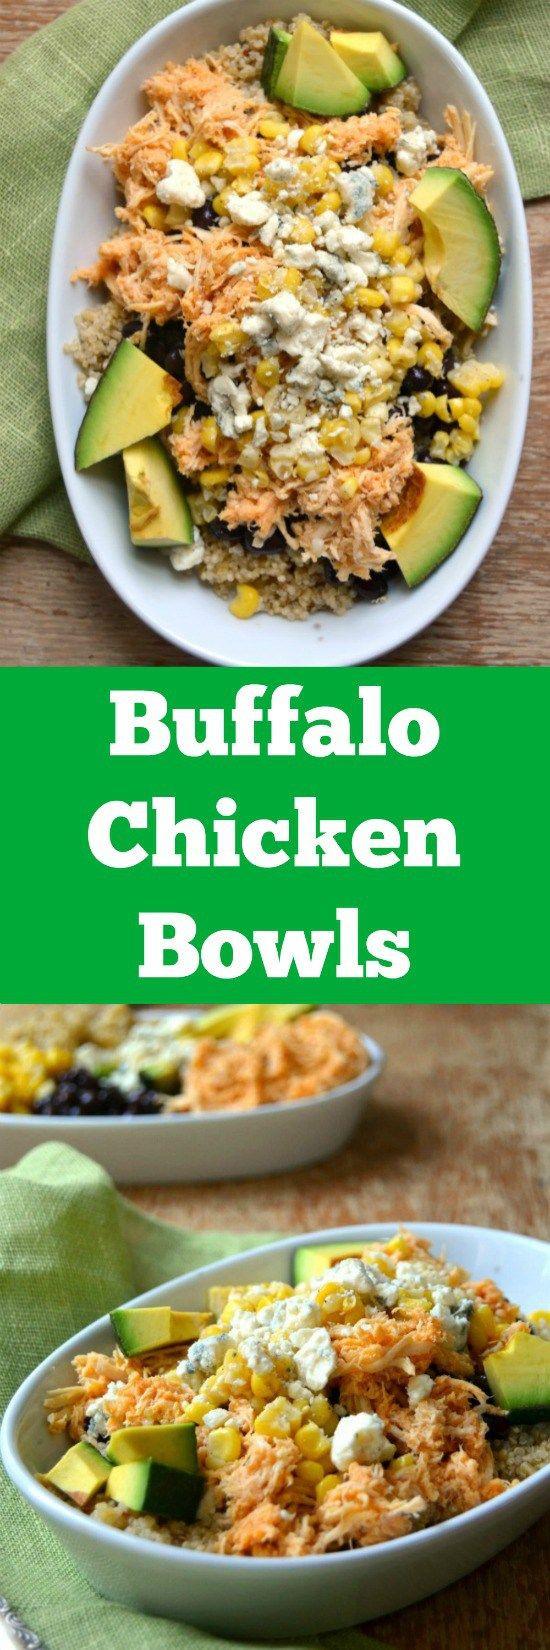 Buffalo Chicken Recipes Healthy  Best 25 Healthy Buffalo Chicken ideas on Pinterest